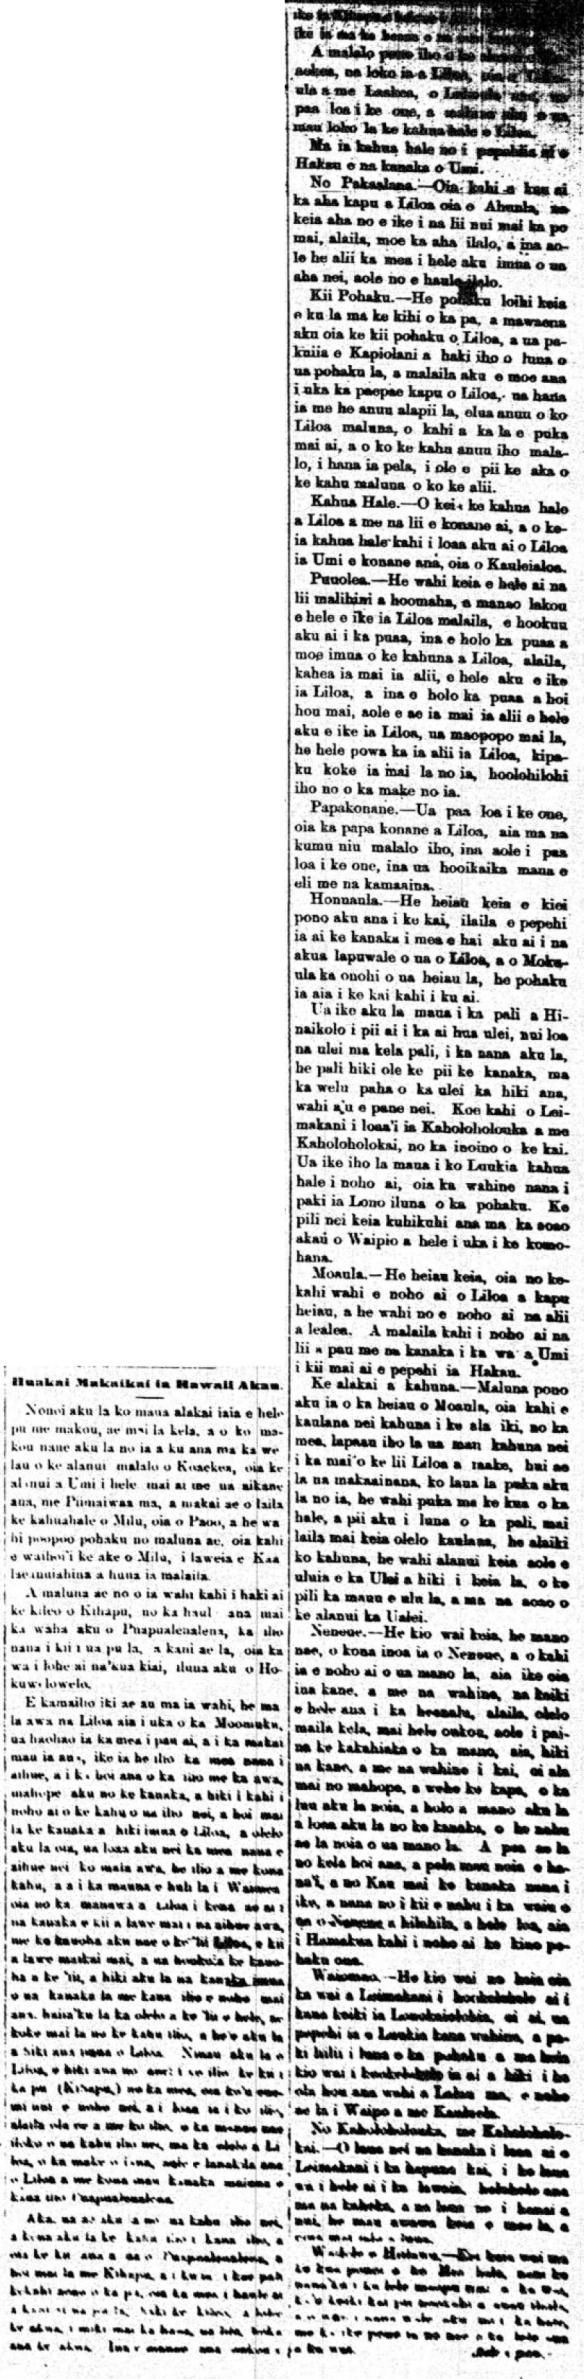 LahuiHawaii_11_1_1872_2